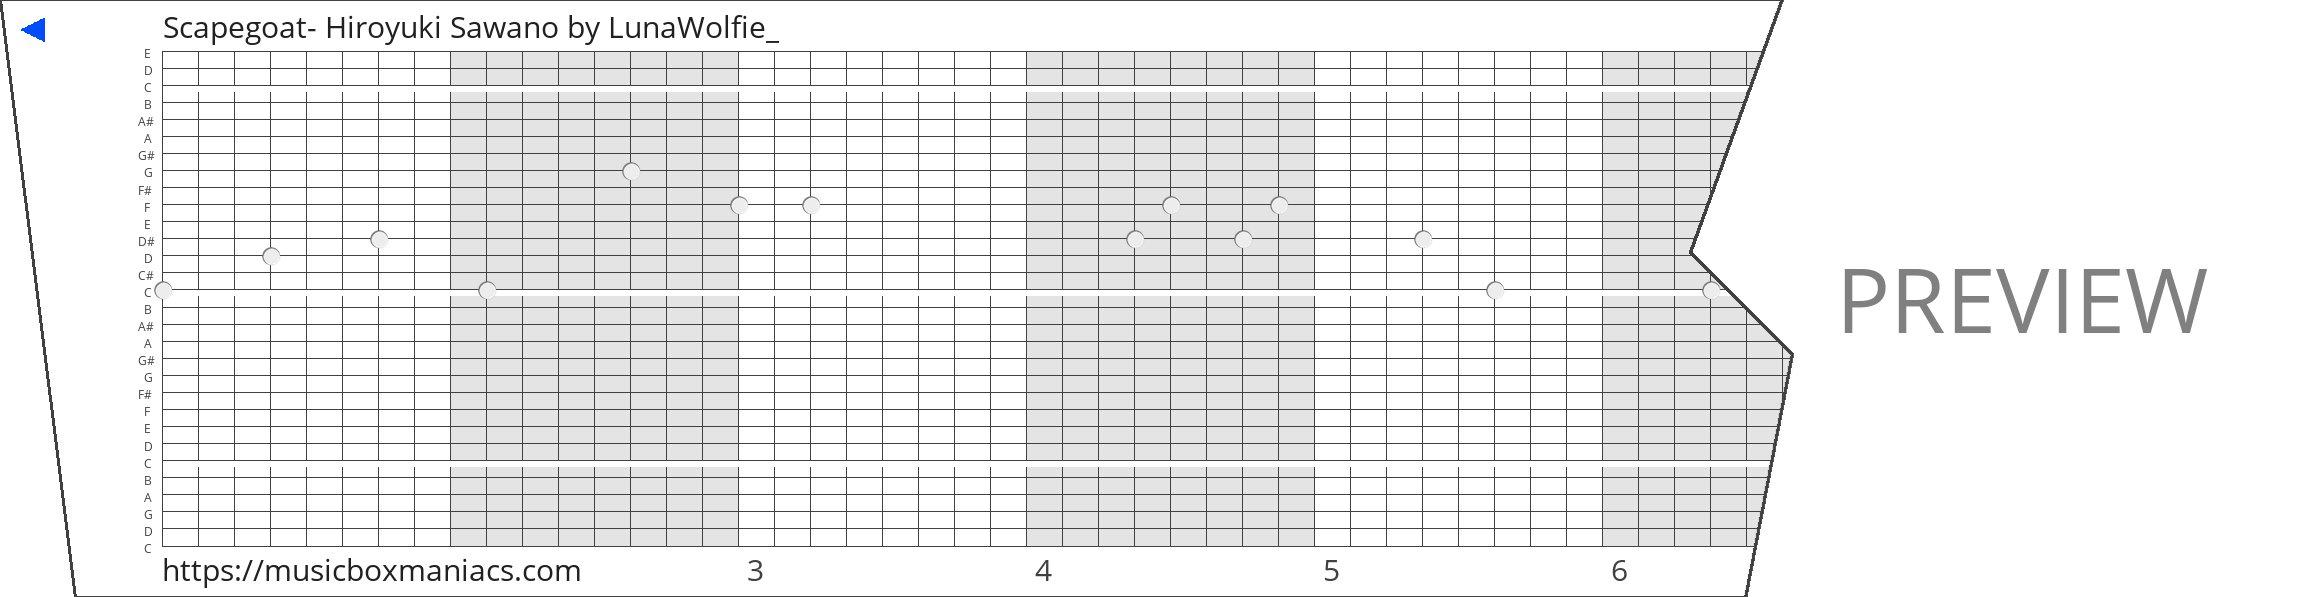 Scapegoat- Hiroyuki Sawano 30 note music box paper strip